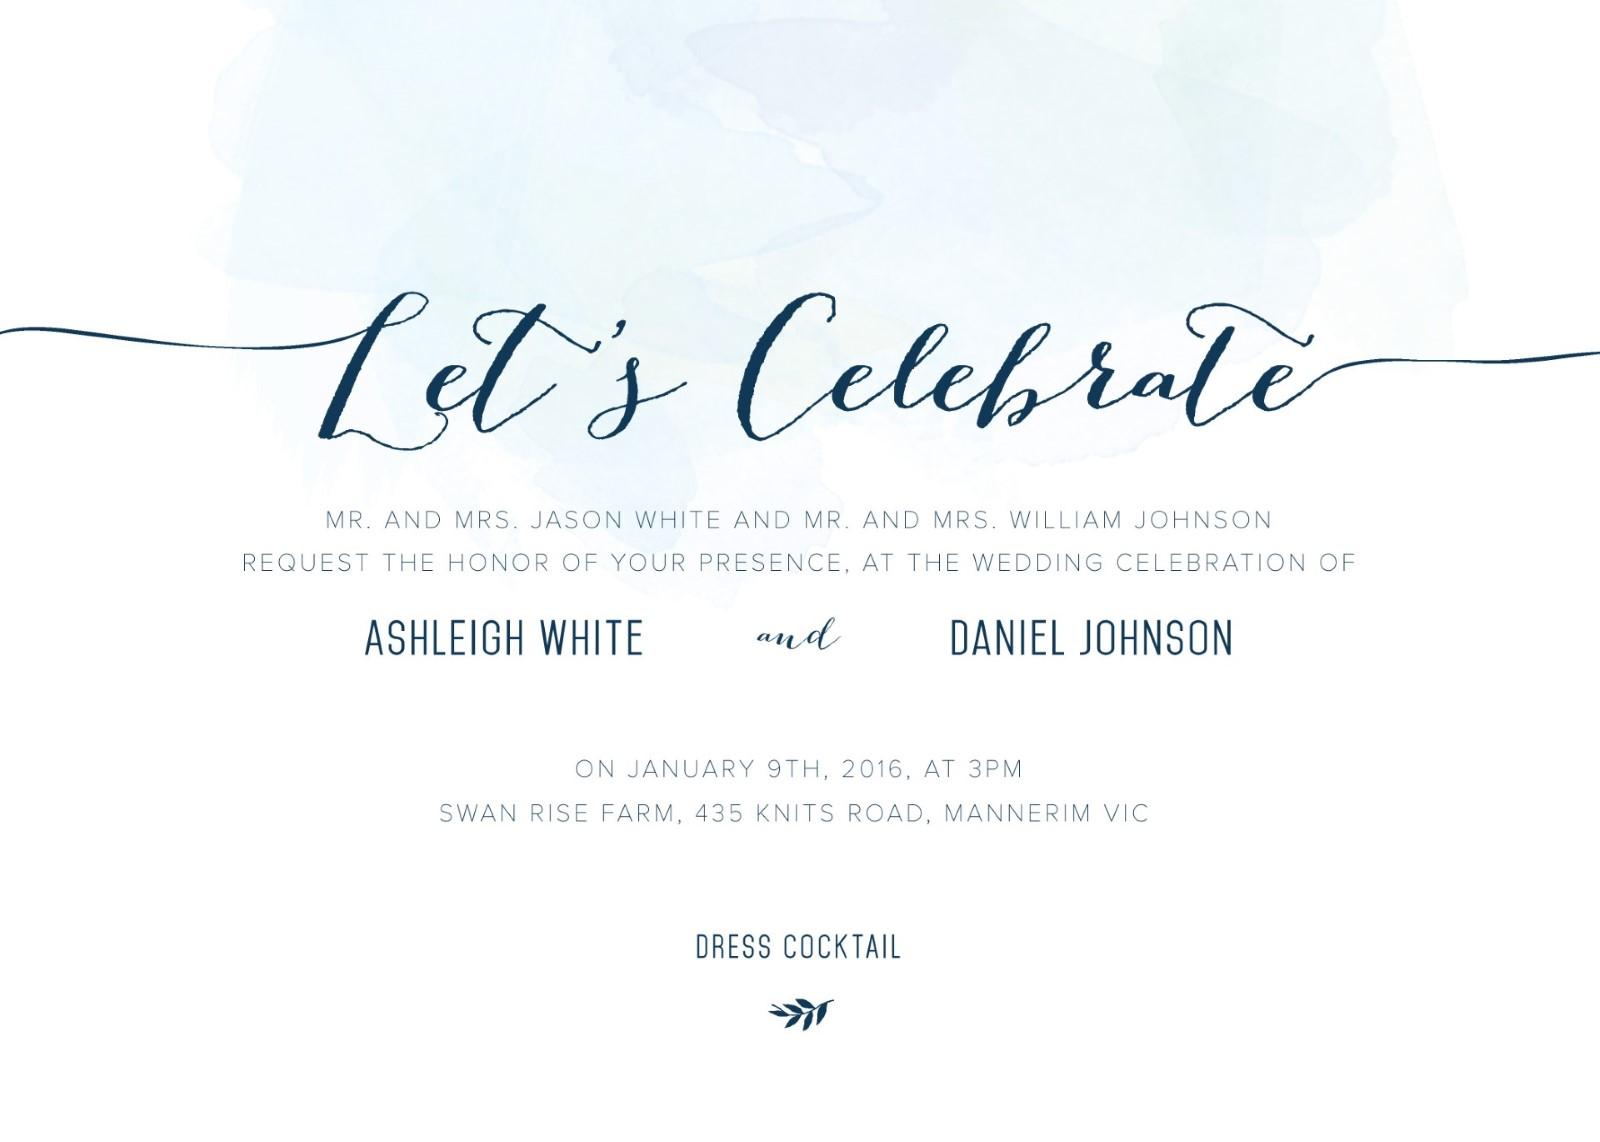 Clouds digital printing wedding invitations - Celebrating home designer login ...